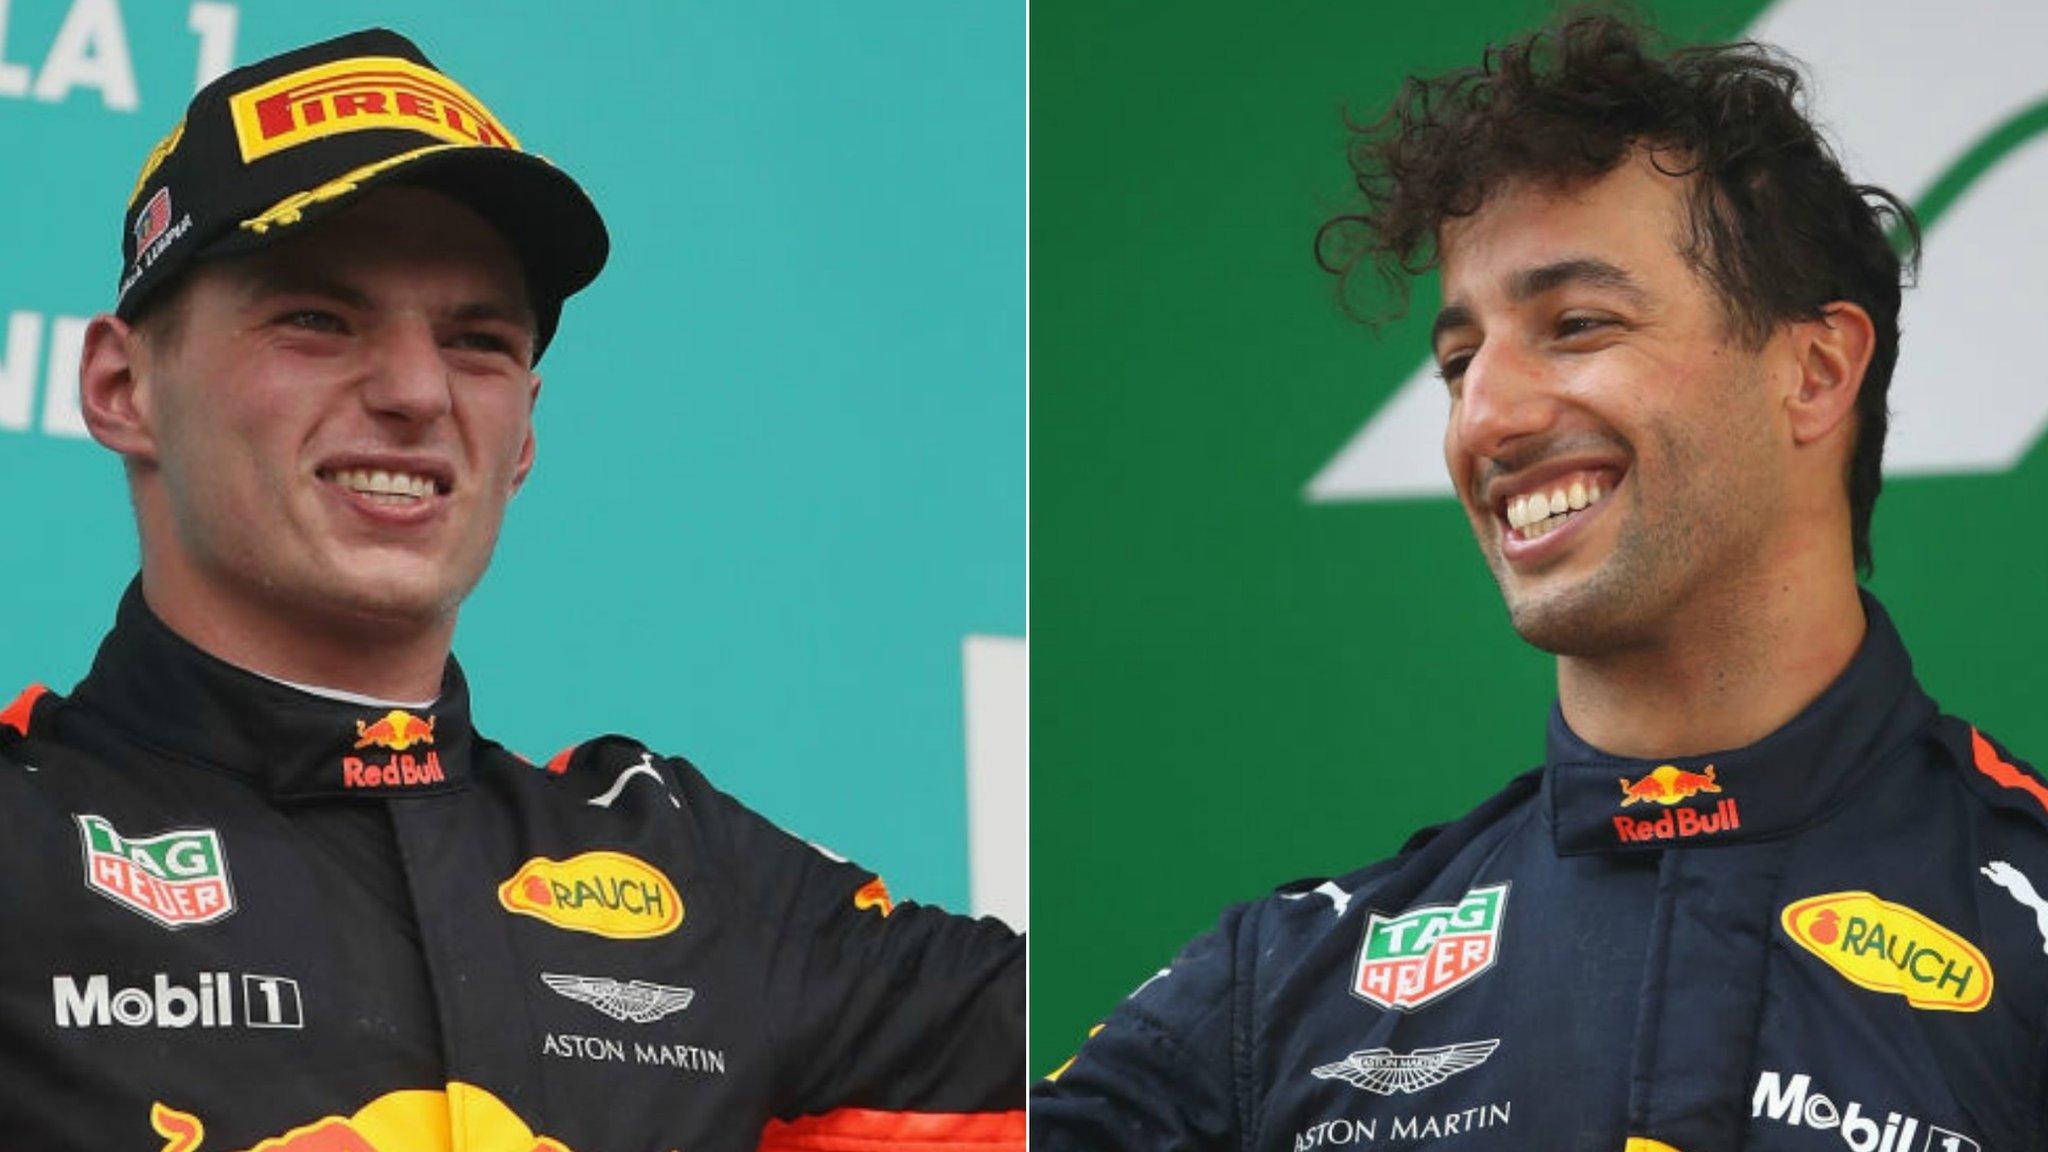 Daniel Ricciardo v Max Verstappen: Which Red Bull driver is best?